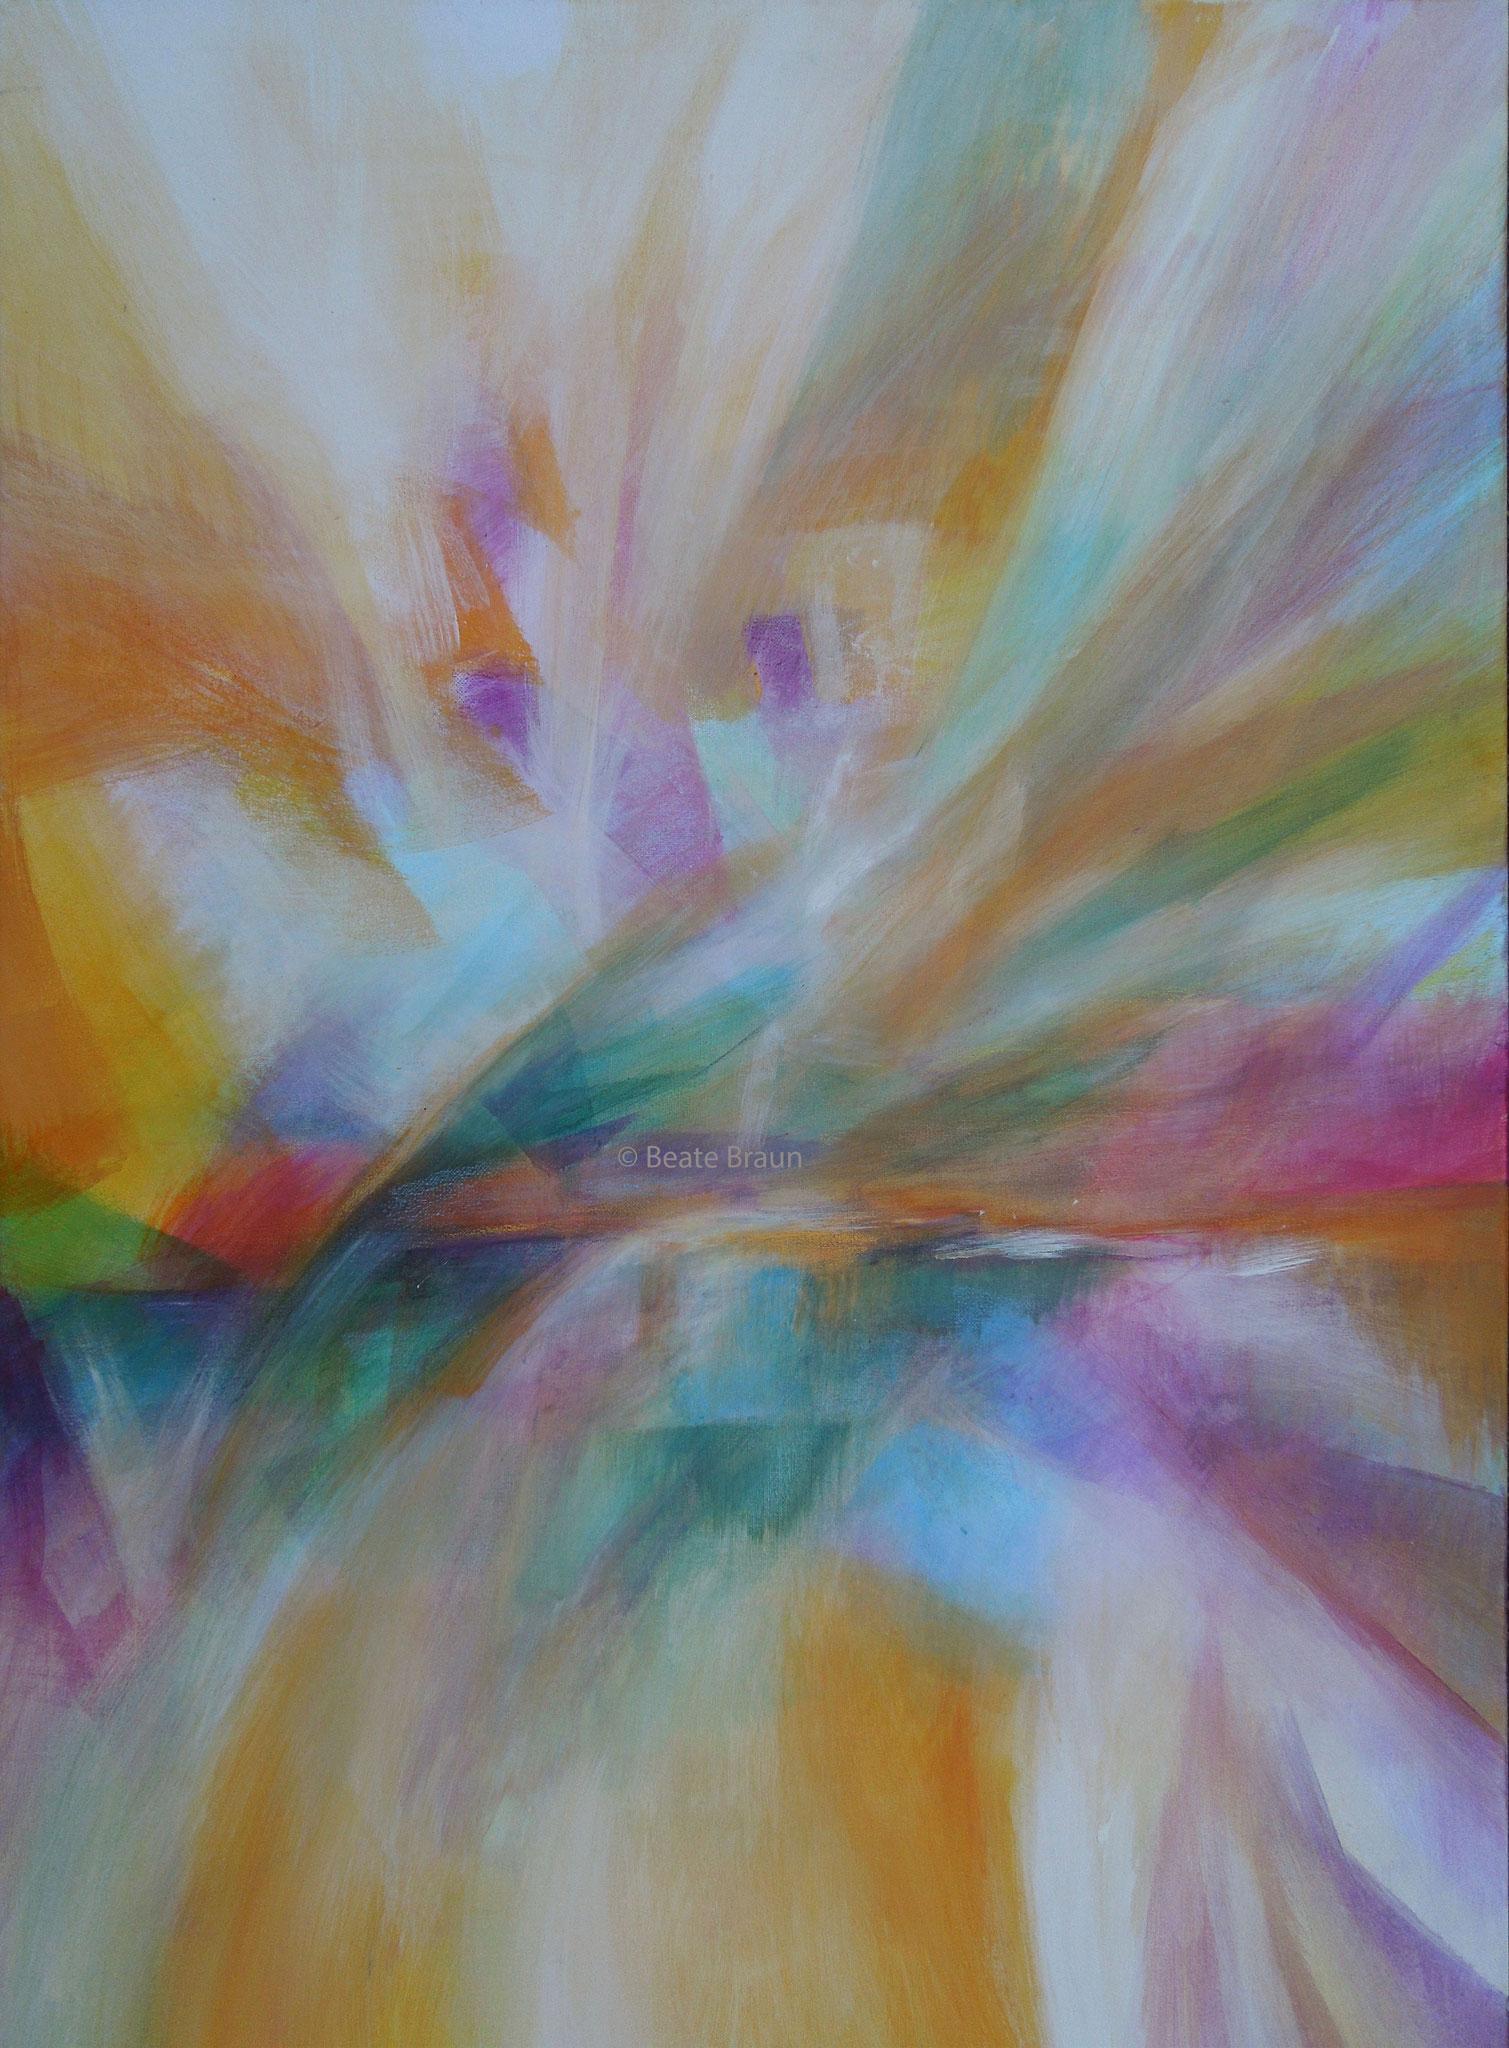 Kristalllandschaft | 70 x 100cm | Acryl auf Leinwand | 2017